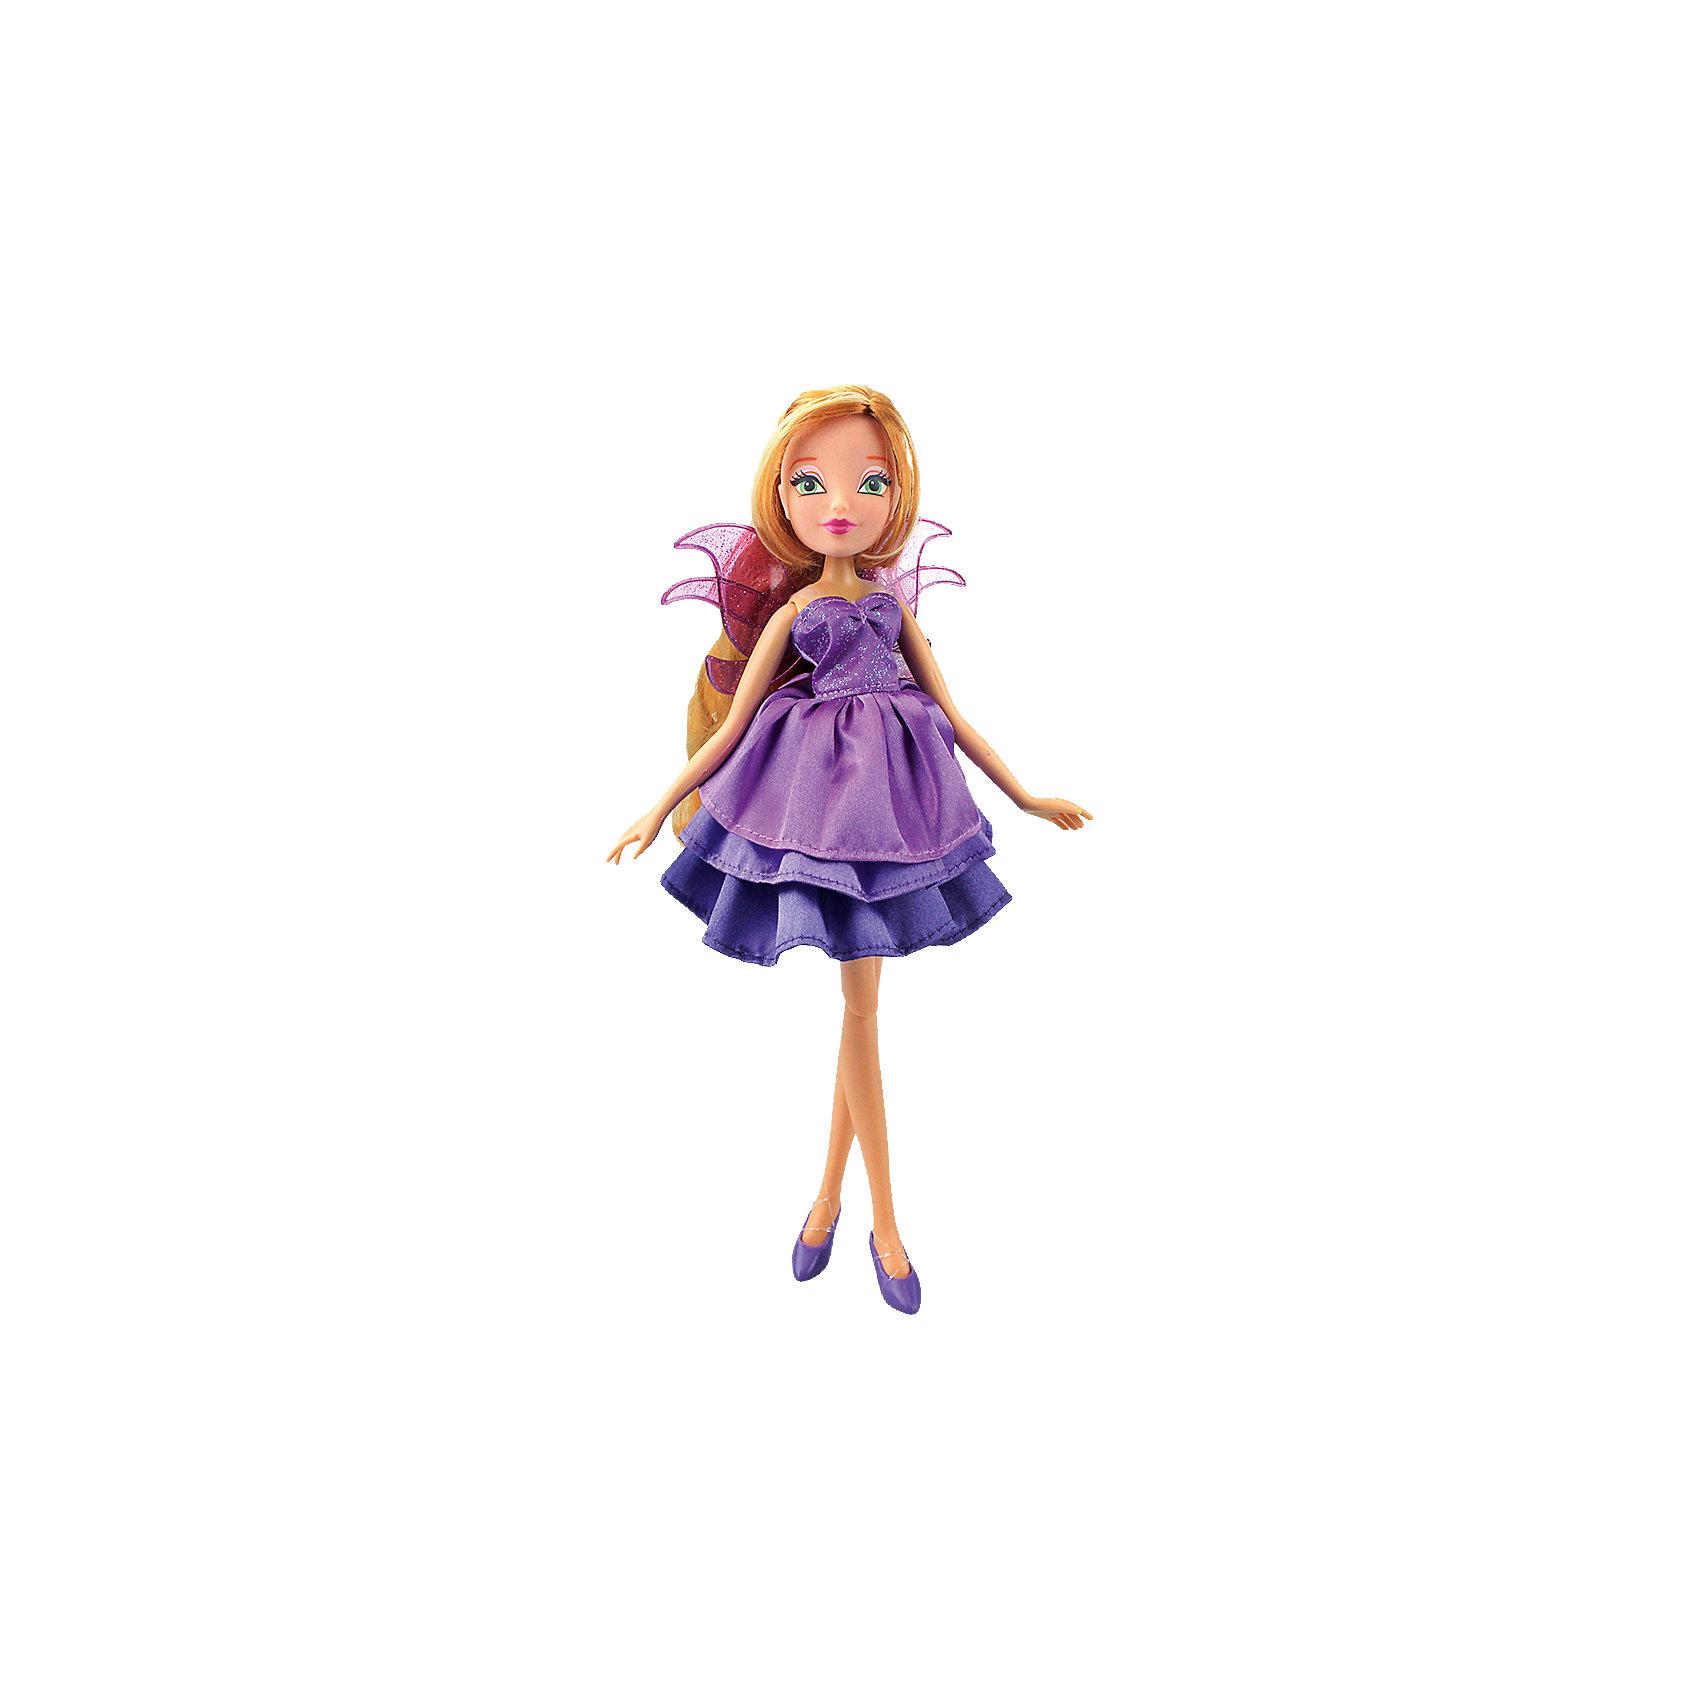 Кукла Флора Волшебное платье, Winx ClubКуклы-модели<br>Doll Winx Club a Magical dress, Flora<br><br>Ширина мм: 60<br>Глубина мм: 355<br>Высота мм: 210<br>Вес г: 304<br>Возраст от месяцев: 36<br>Возраст до месяцев: 120<br>Пол: Женский<br>Возраст: Детский<br>SKU: 5532626